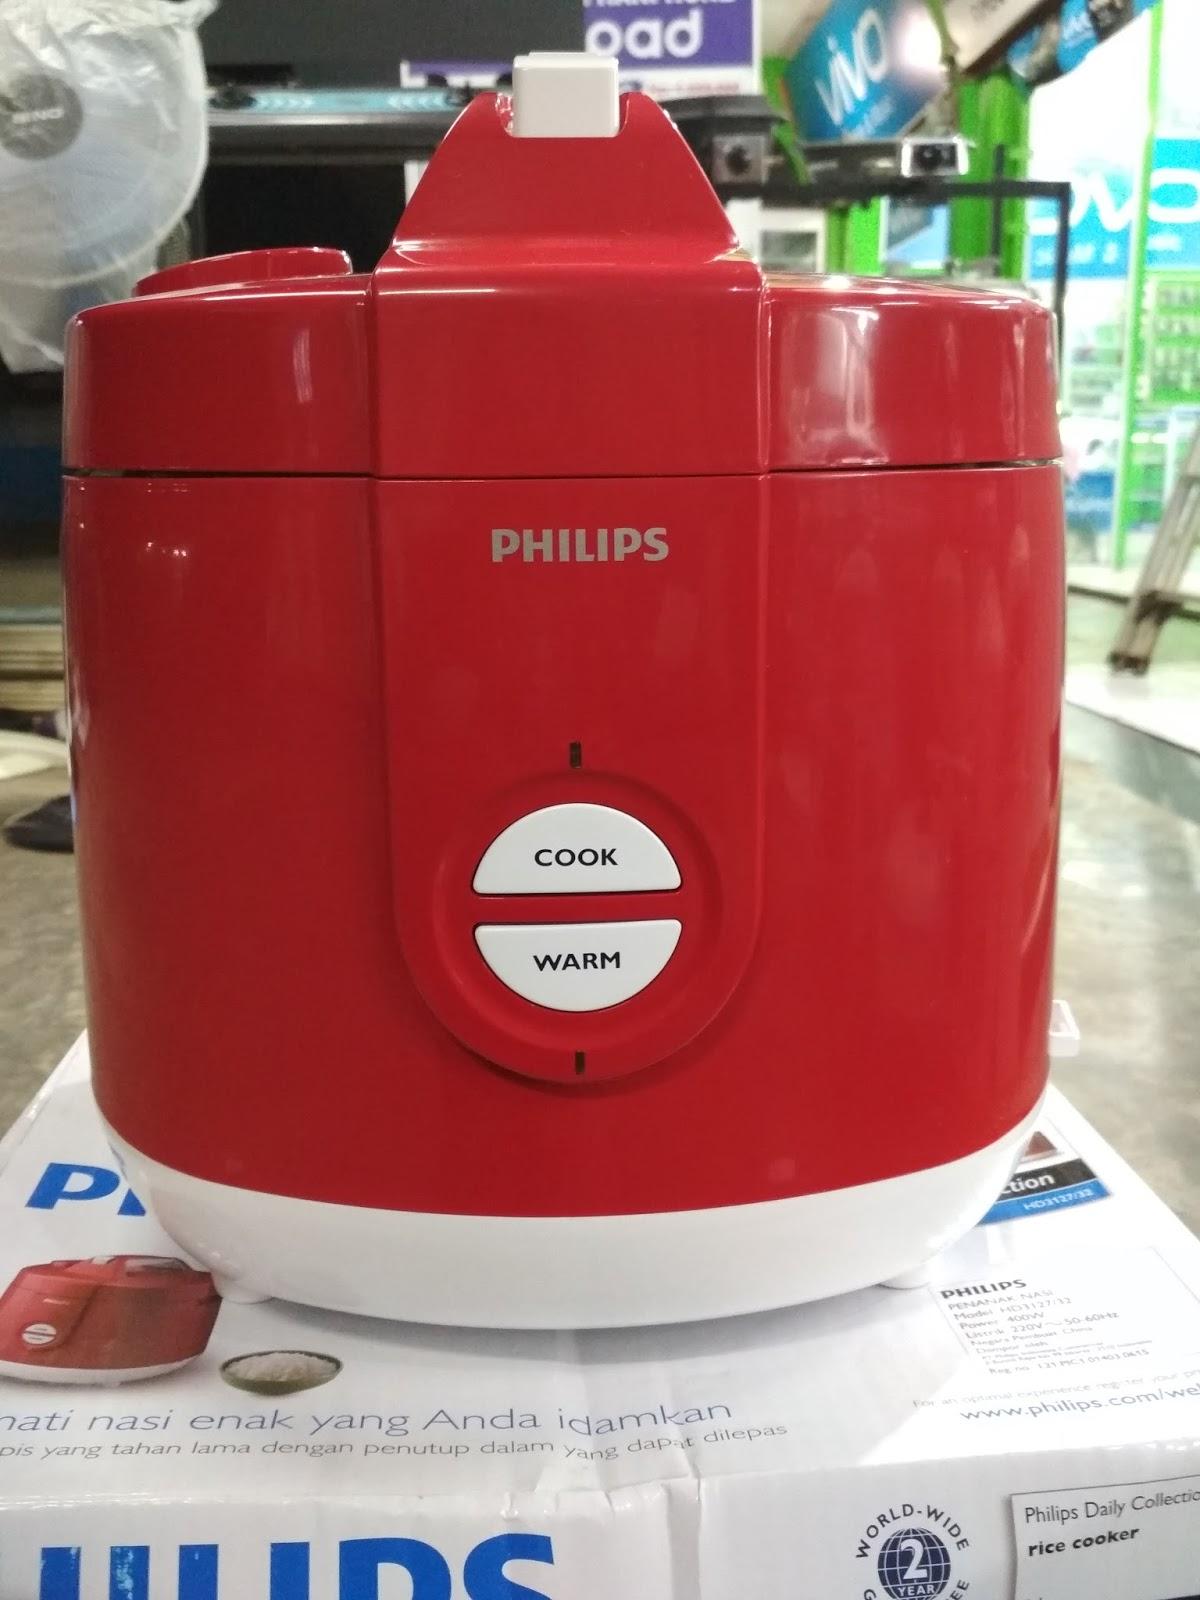 Rice Cooker Philips Hd3127 30 2l 400w Hijau A Big Deal Basic Green Hd3118 Free Sunlight New Daily Collection Img 20170723 130454 Warna Biru 204236